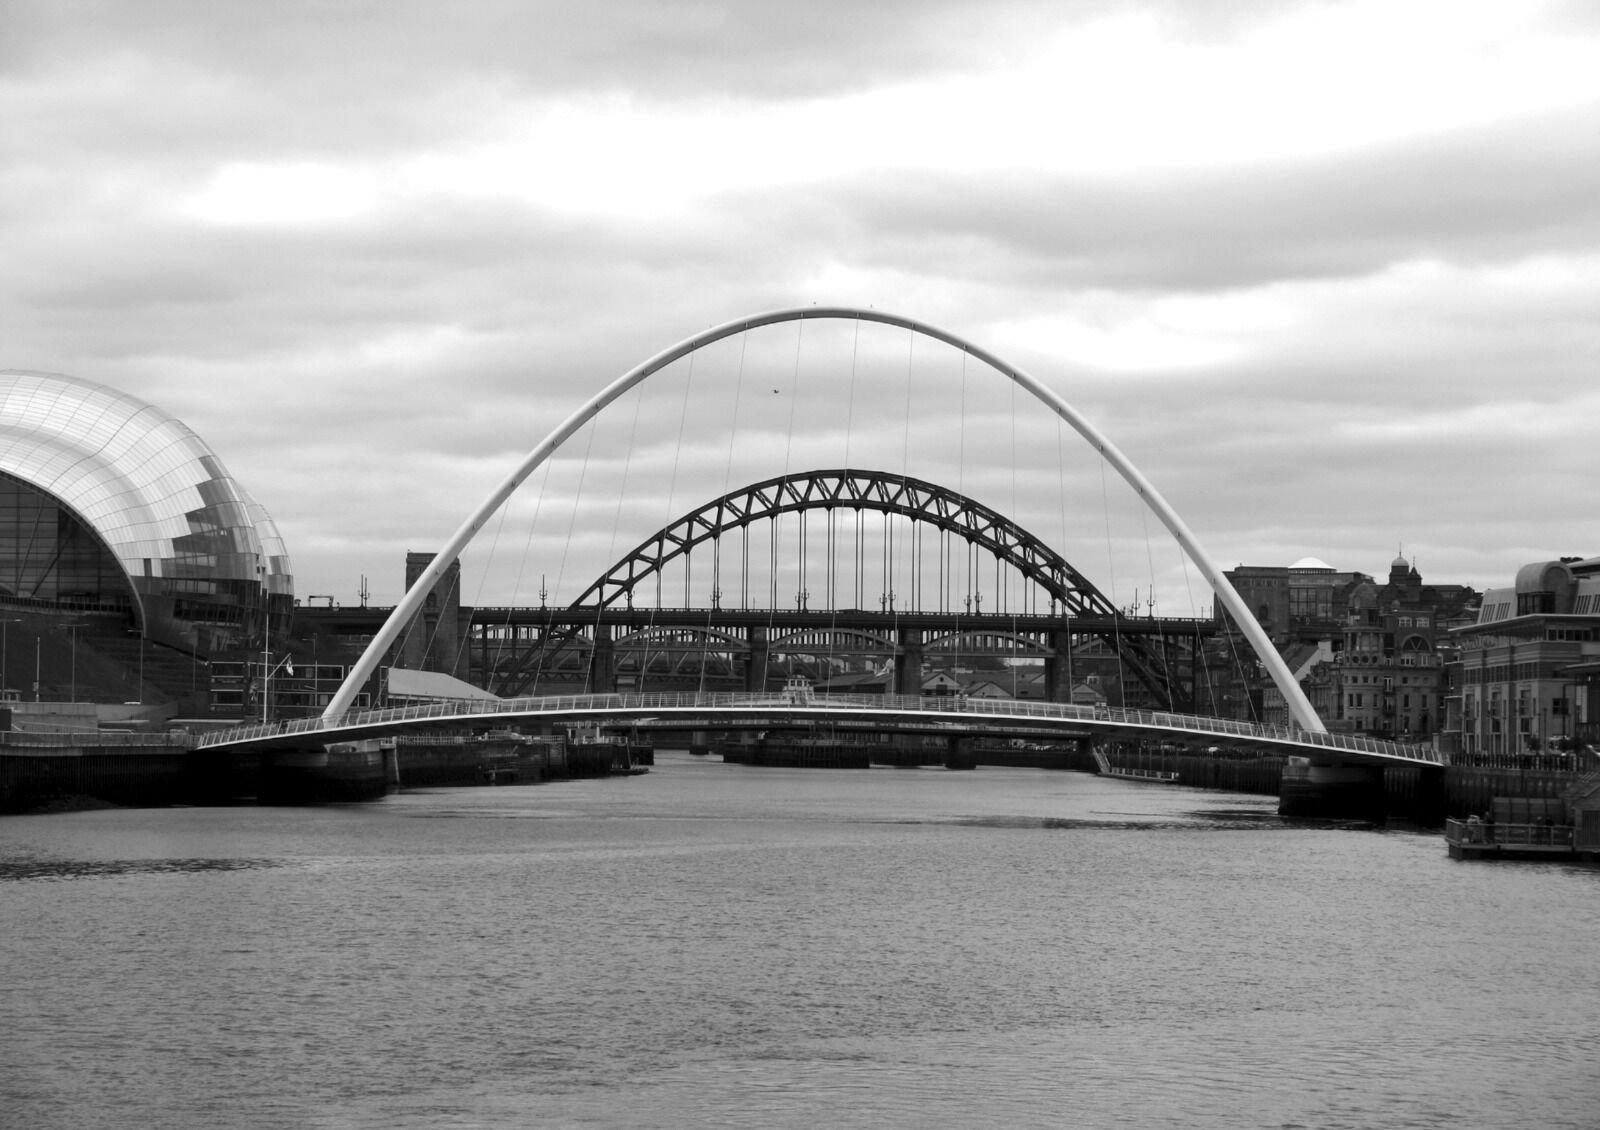 The Five Bridges and the Sage Gateshead